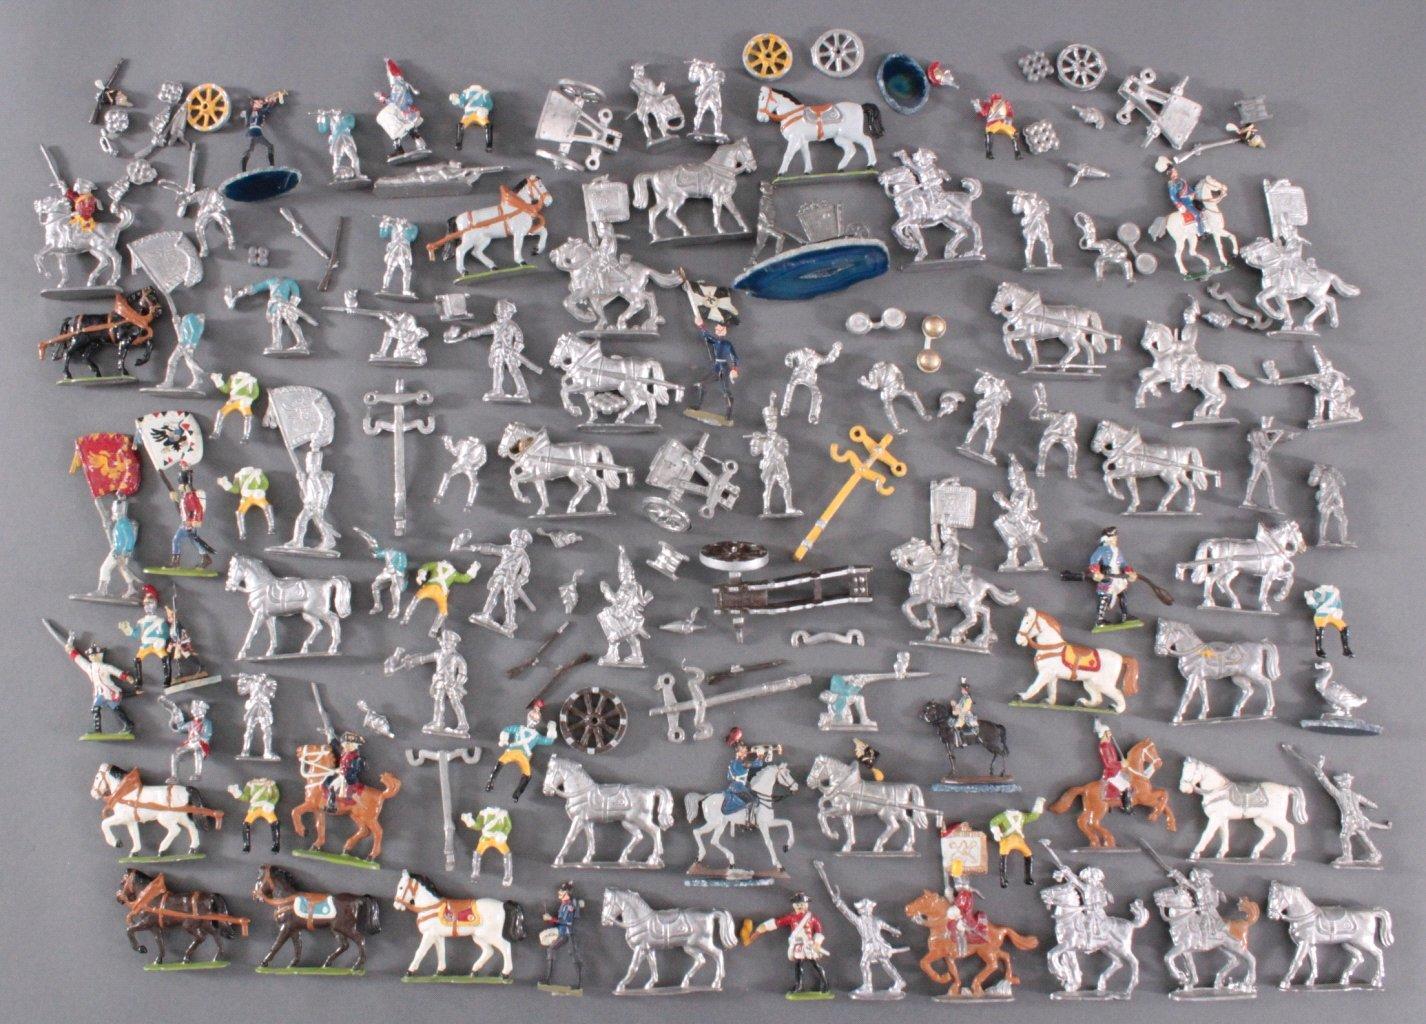 Sammlung Zinnfiguren, weit über 60 Stück